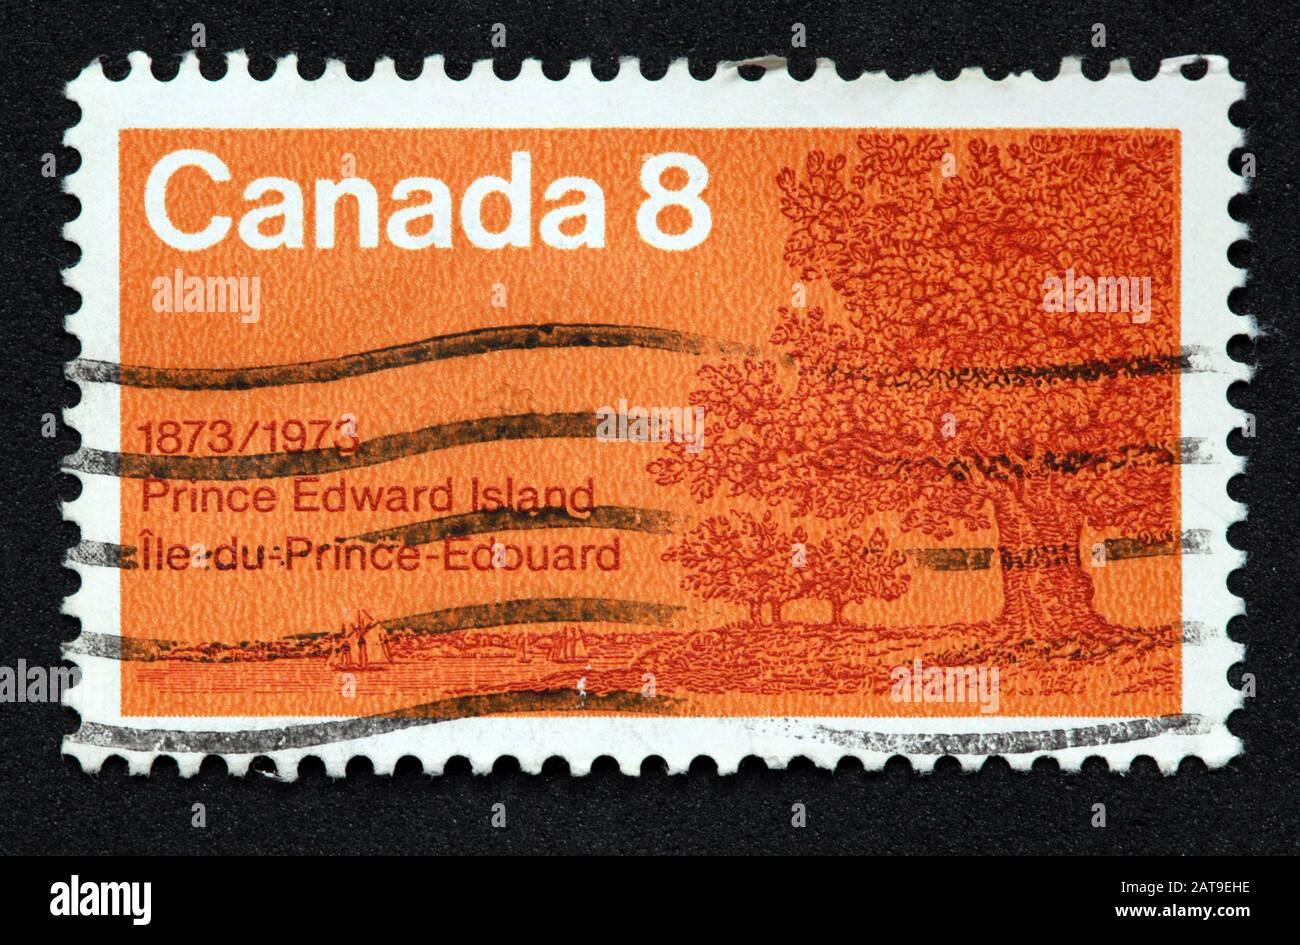 Dieses Stockfoto: Kanadische Briefmarke, Canada Stamp, Canada Post, used Stamp, Canada 8c,8Cent, , 1873-1973, Prince Edward Island, ile du Prince-edouard,Orange,Orange Stamp - 2AT9EH